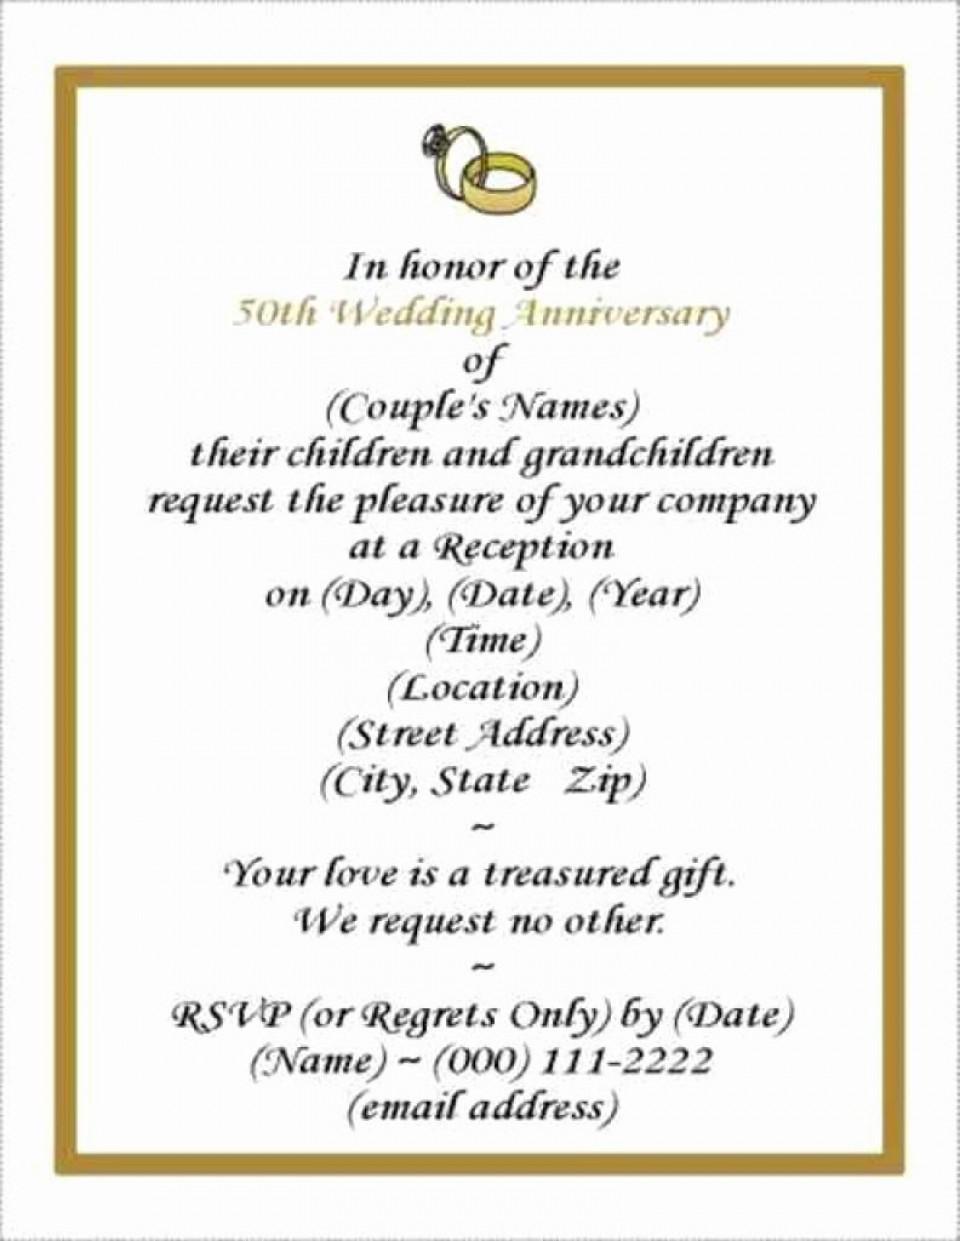 001 Rare Free Printable 50th Wedding Anniversary Invitation Template Design 960